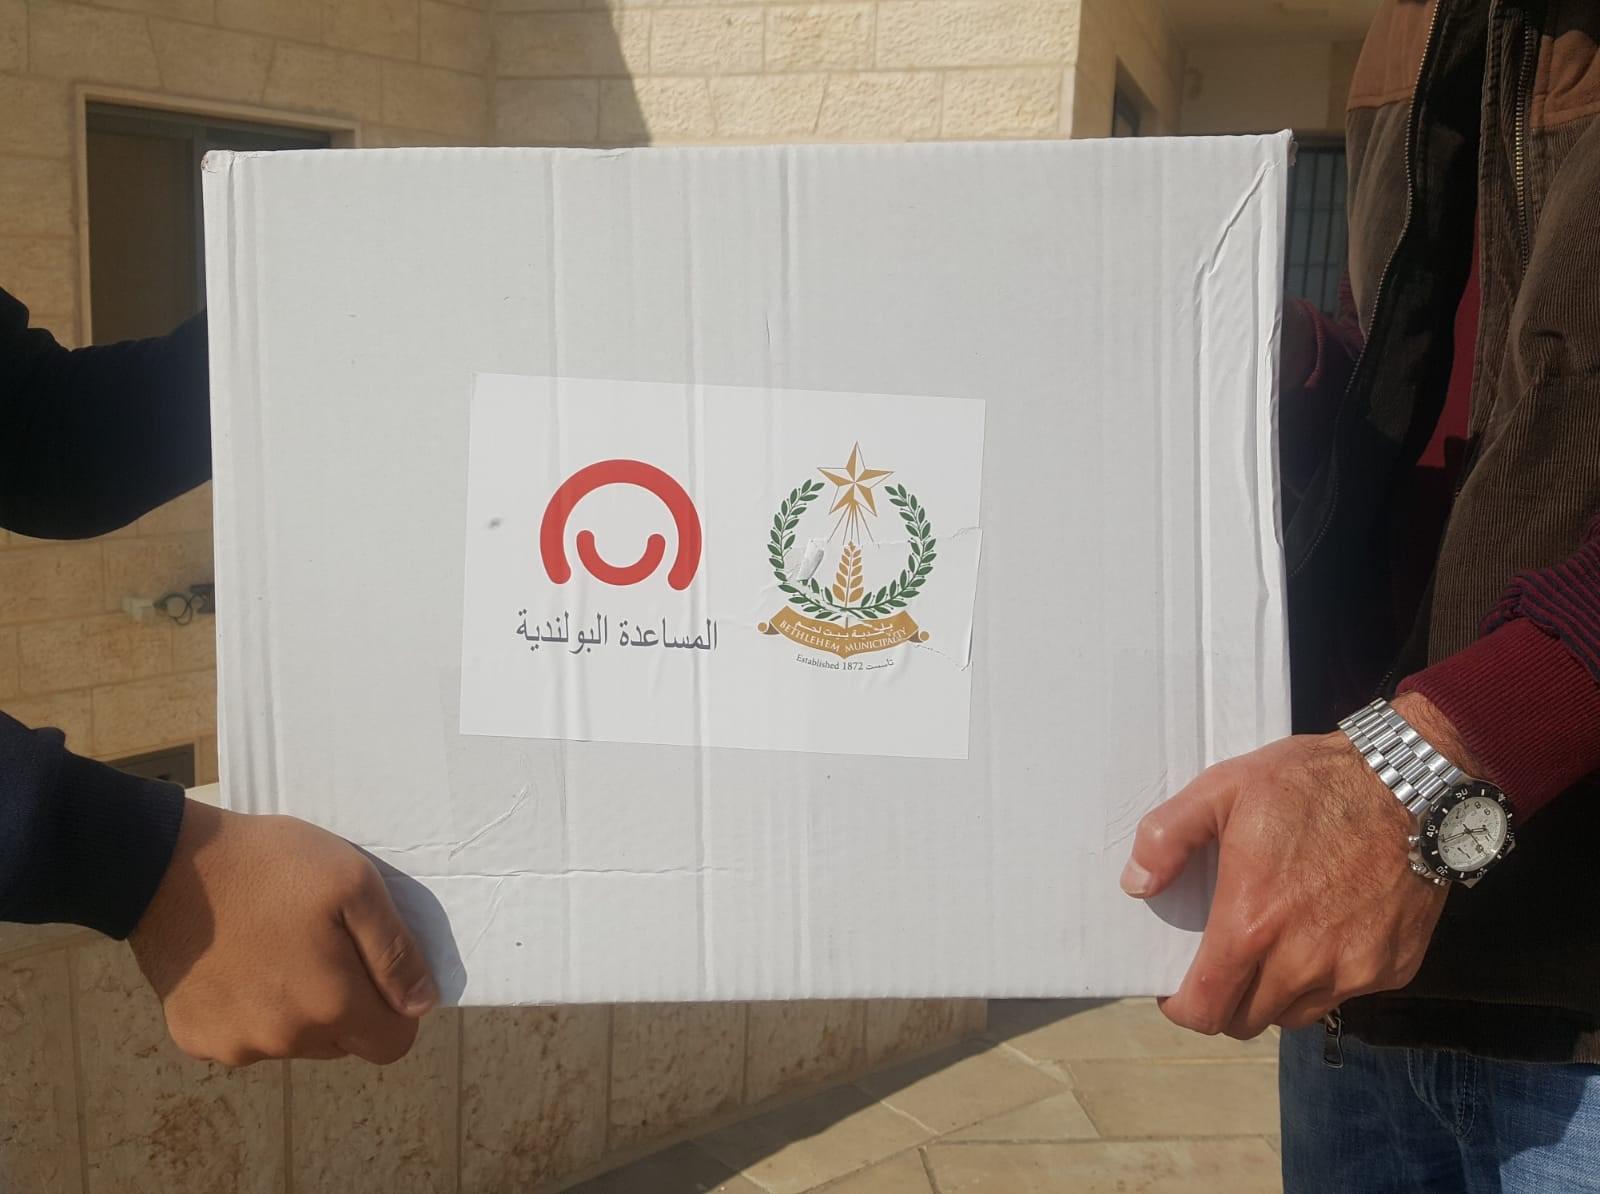 Bethlehem's city authorities receive Polish humanitarian aid